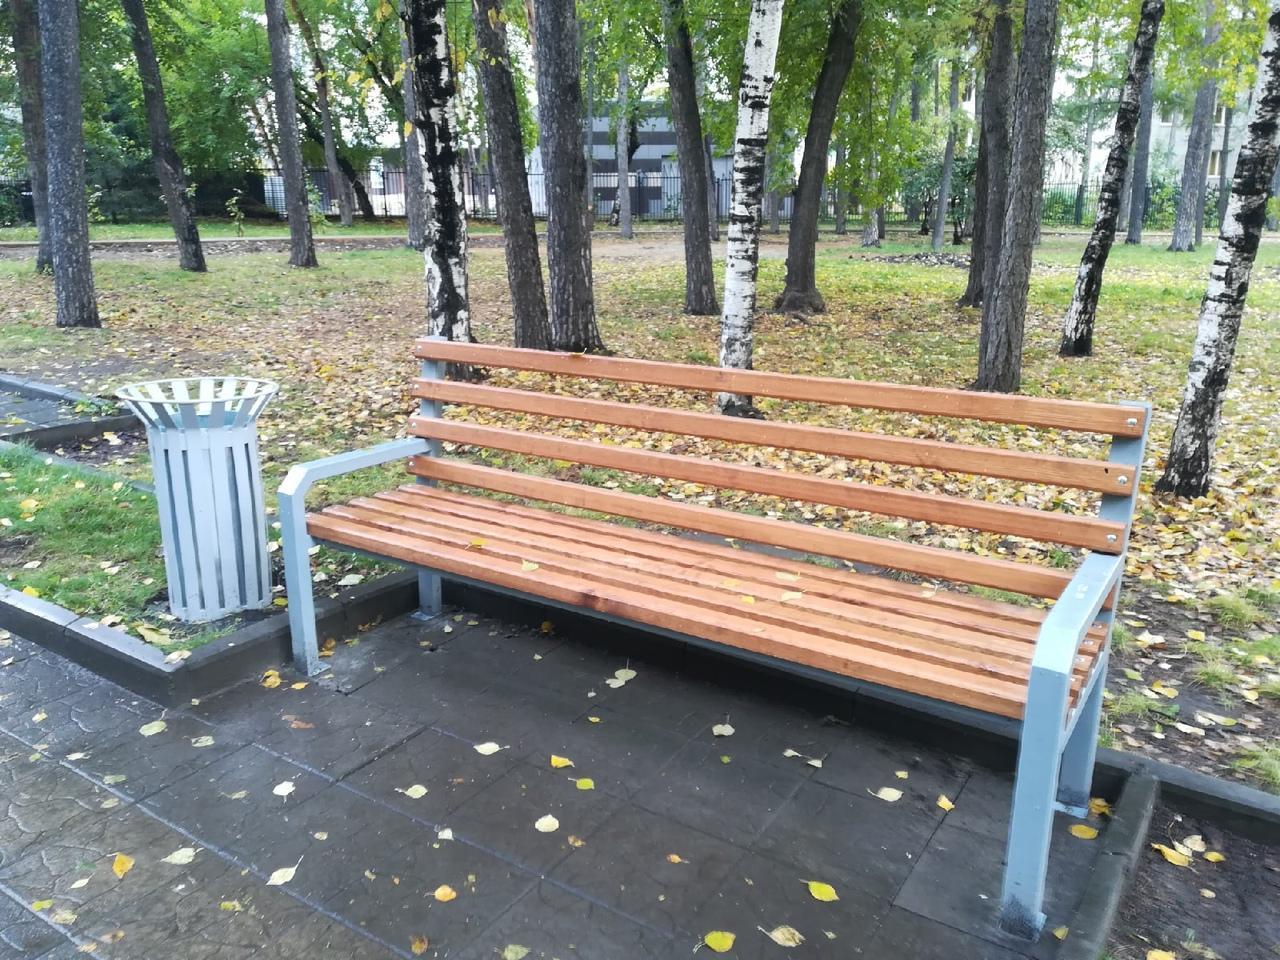 Фото В Новосибирске за 2,8 млн рублей благоустроили сквер на улице Кирова 2